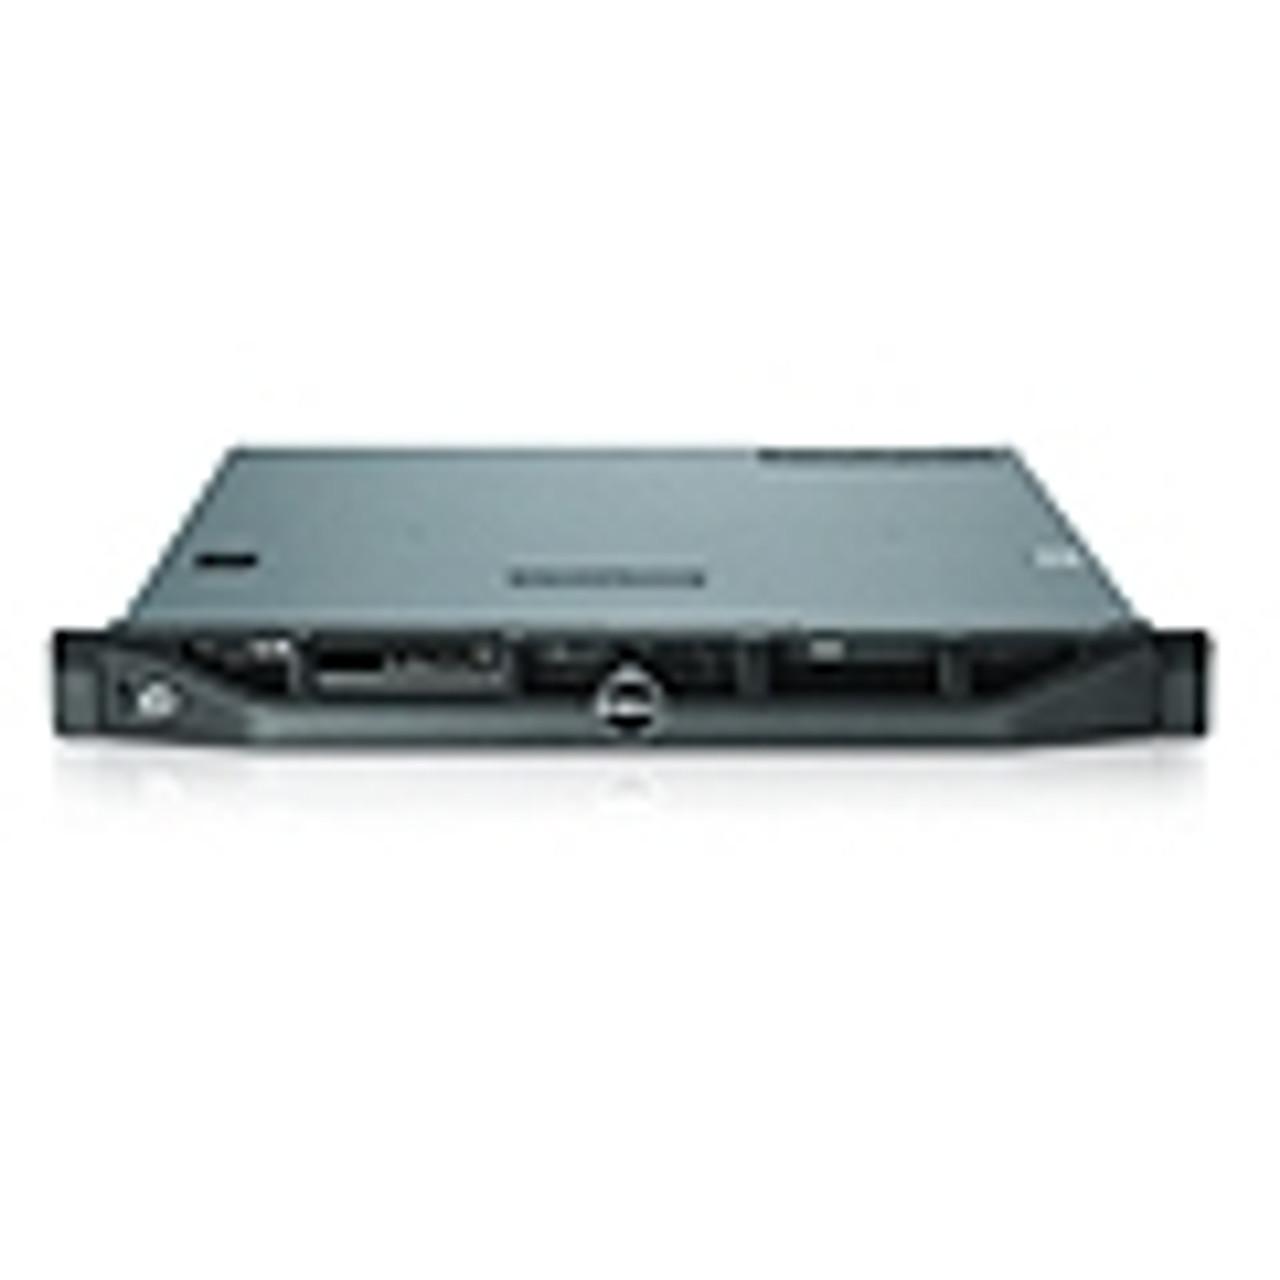 Dell PowerEdge R210 II Servers